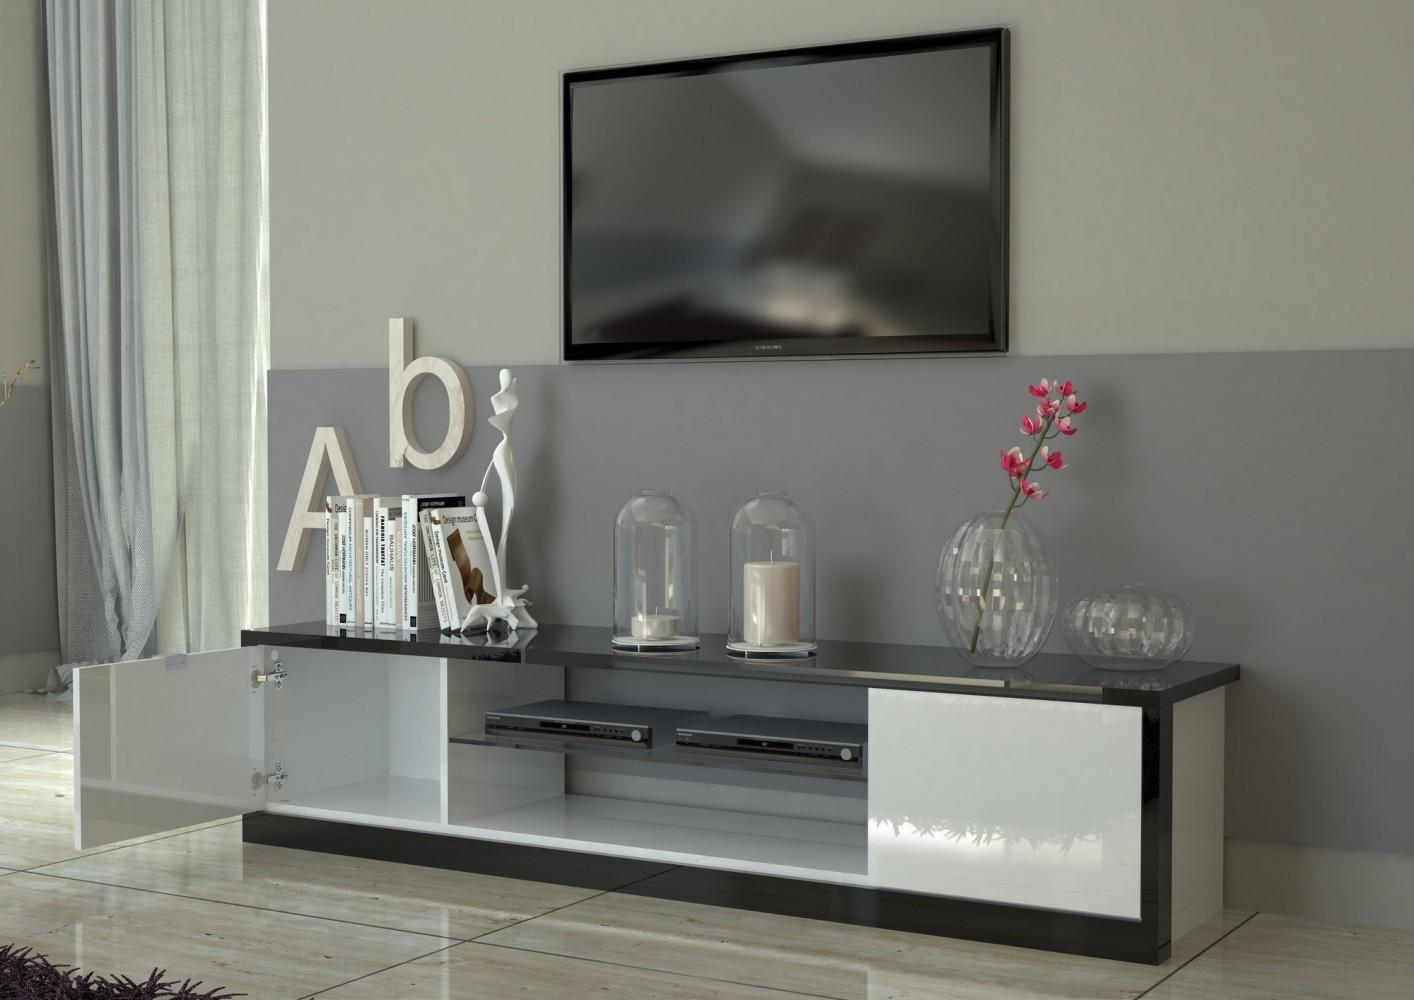 tecnos mito lowboard 180cm wohnwand mediawand italian design modern neu ebay. Black Bedroom Furniture Sets. Home Design Ideas